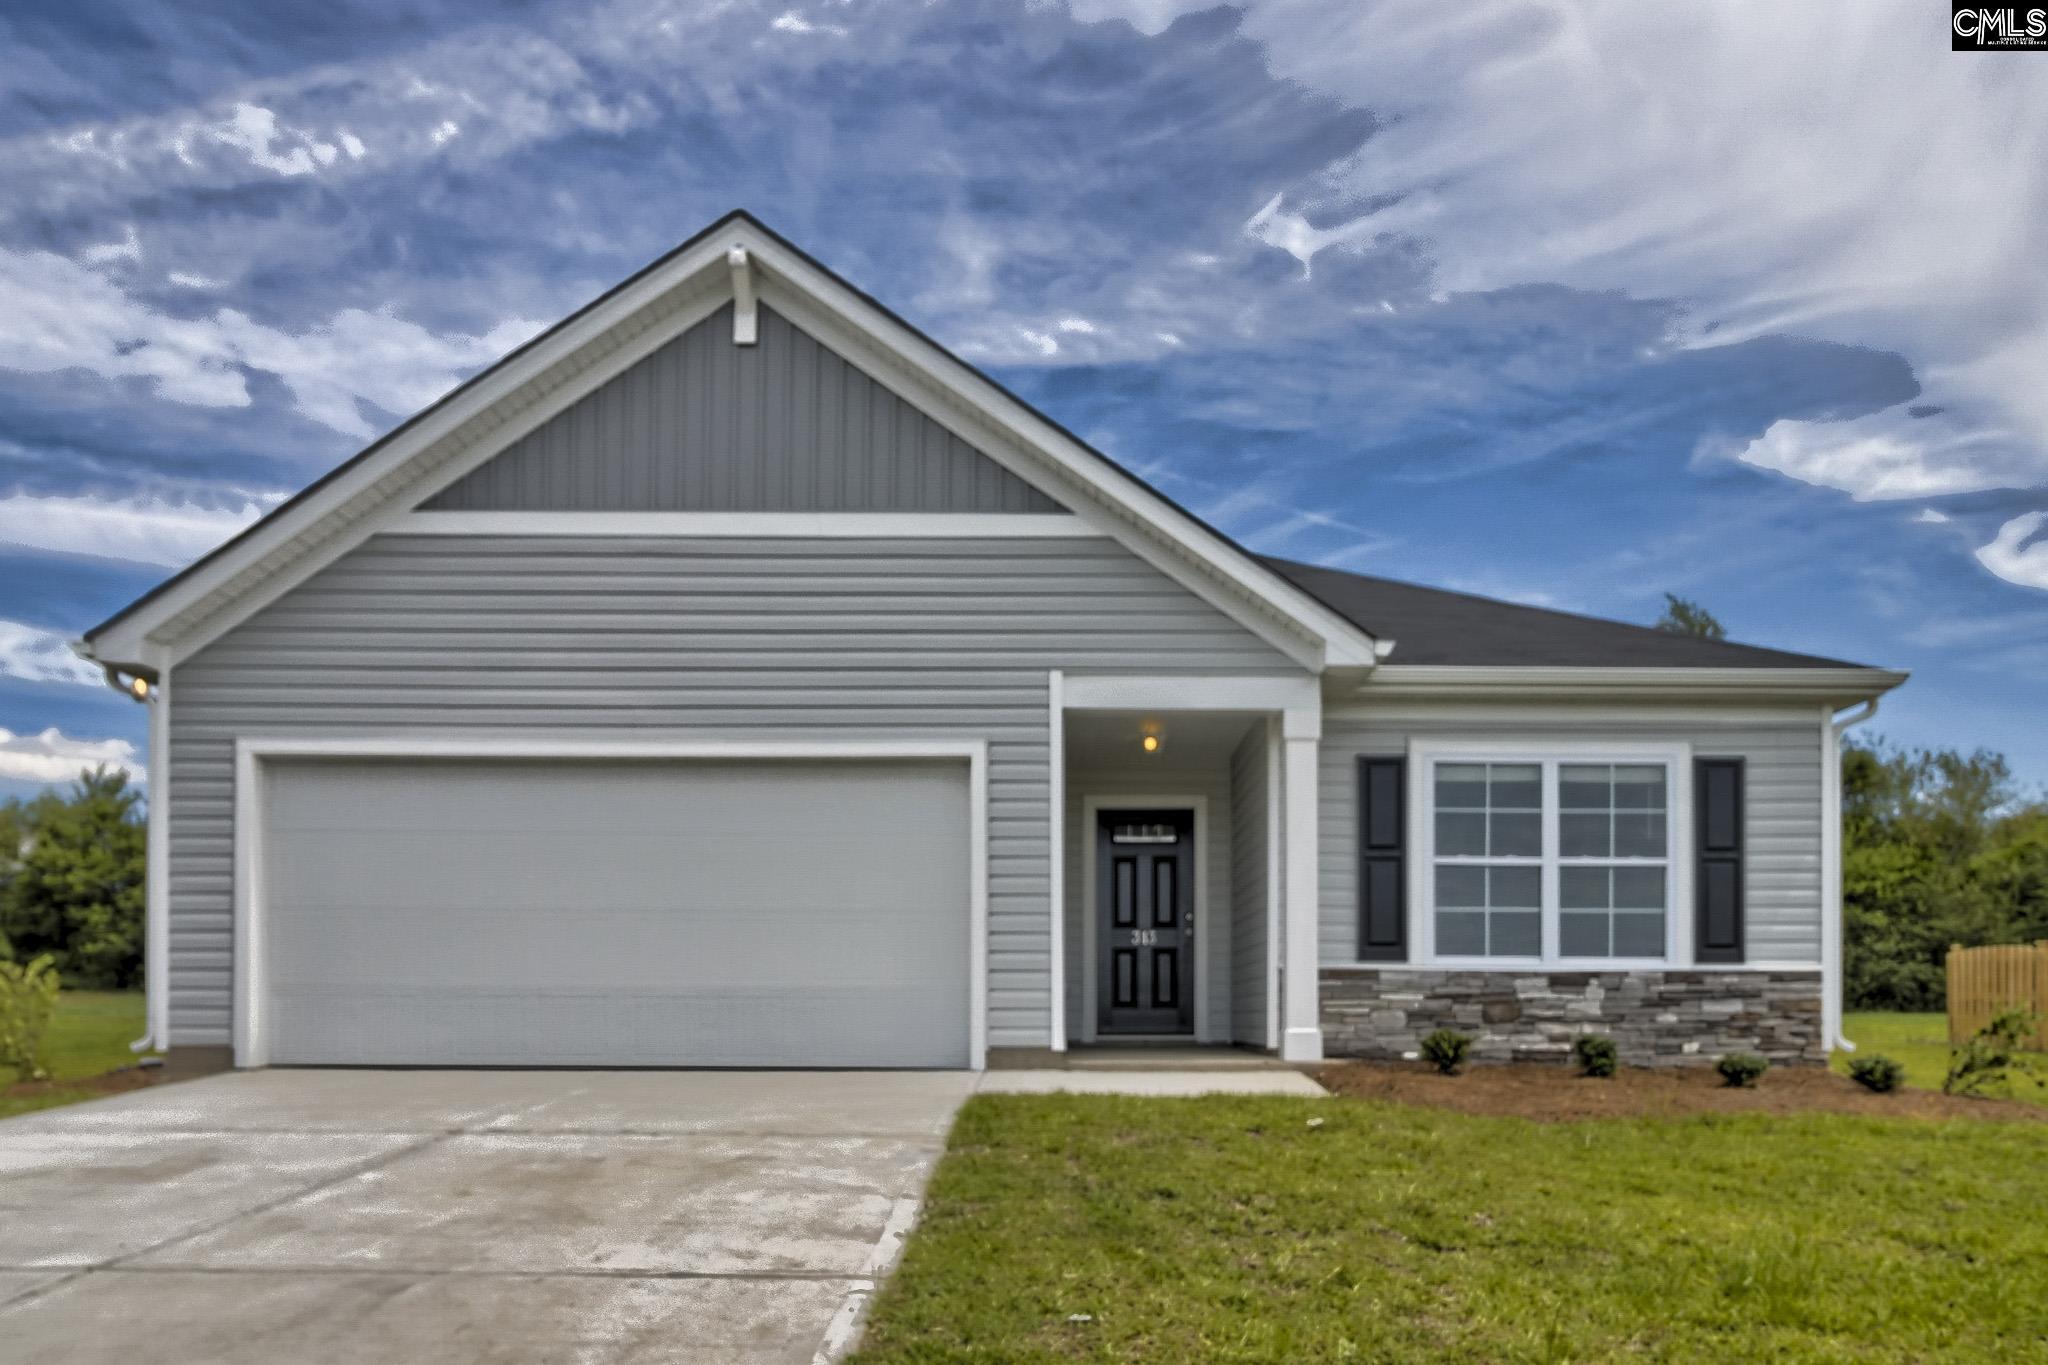 314 Bush Clover Leesville, SC 29070